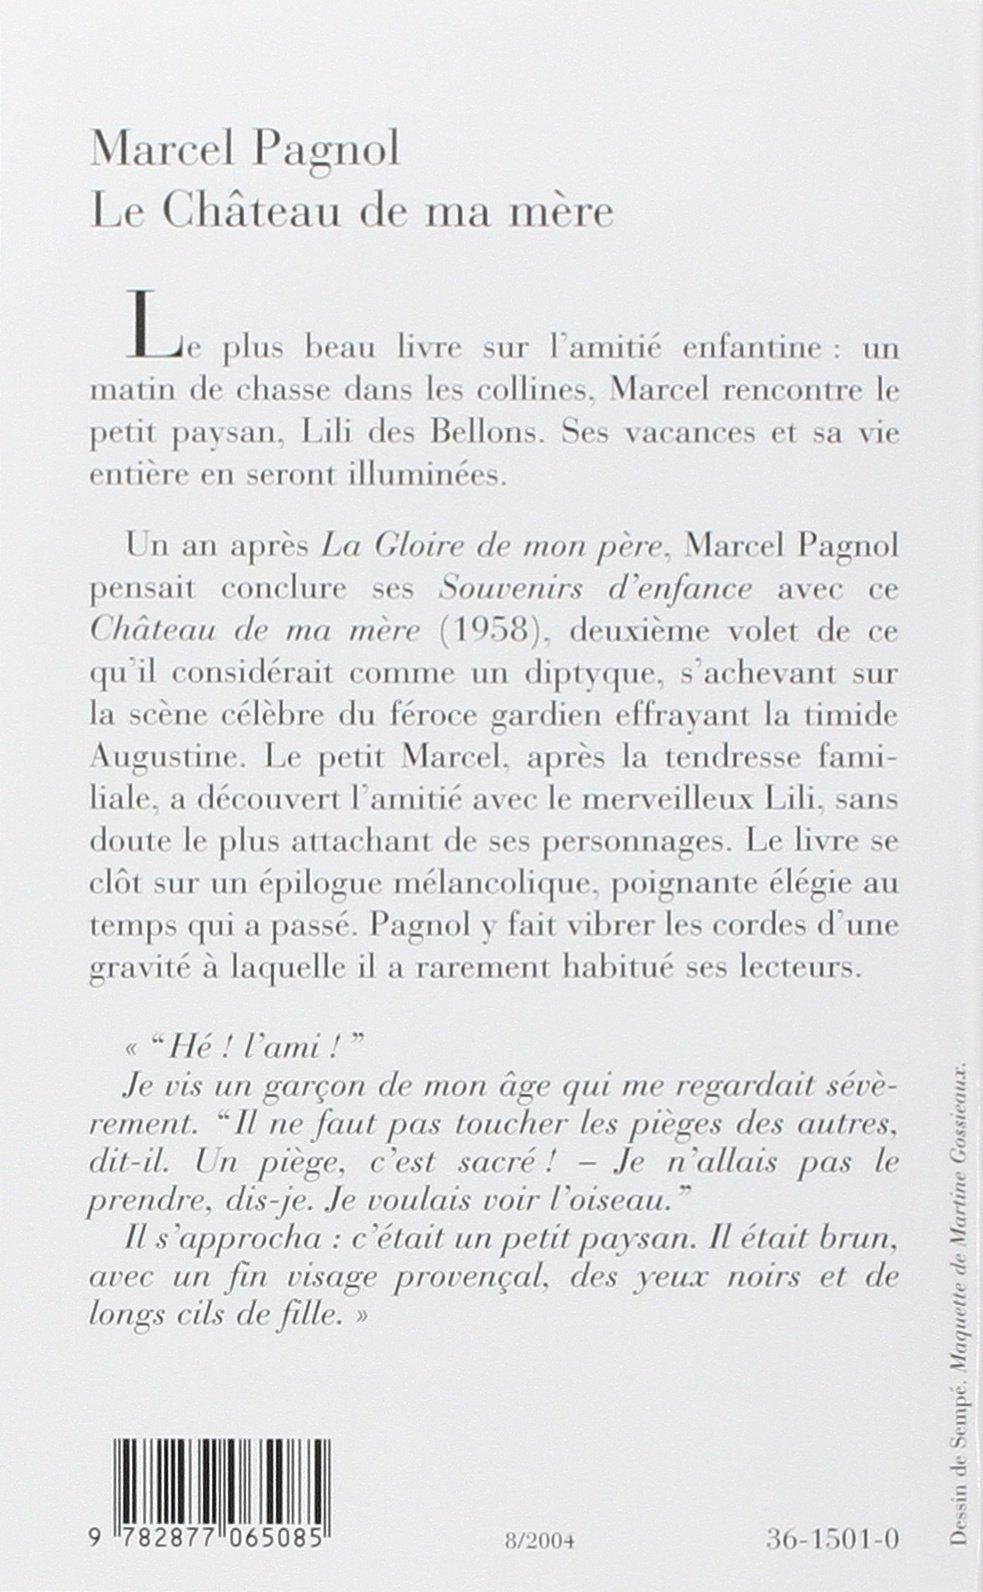 Le Chateau De Ma Mère Fortunio Amazones Marcel Pagnol